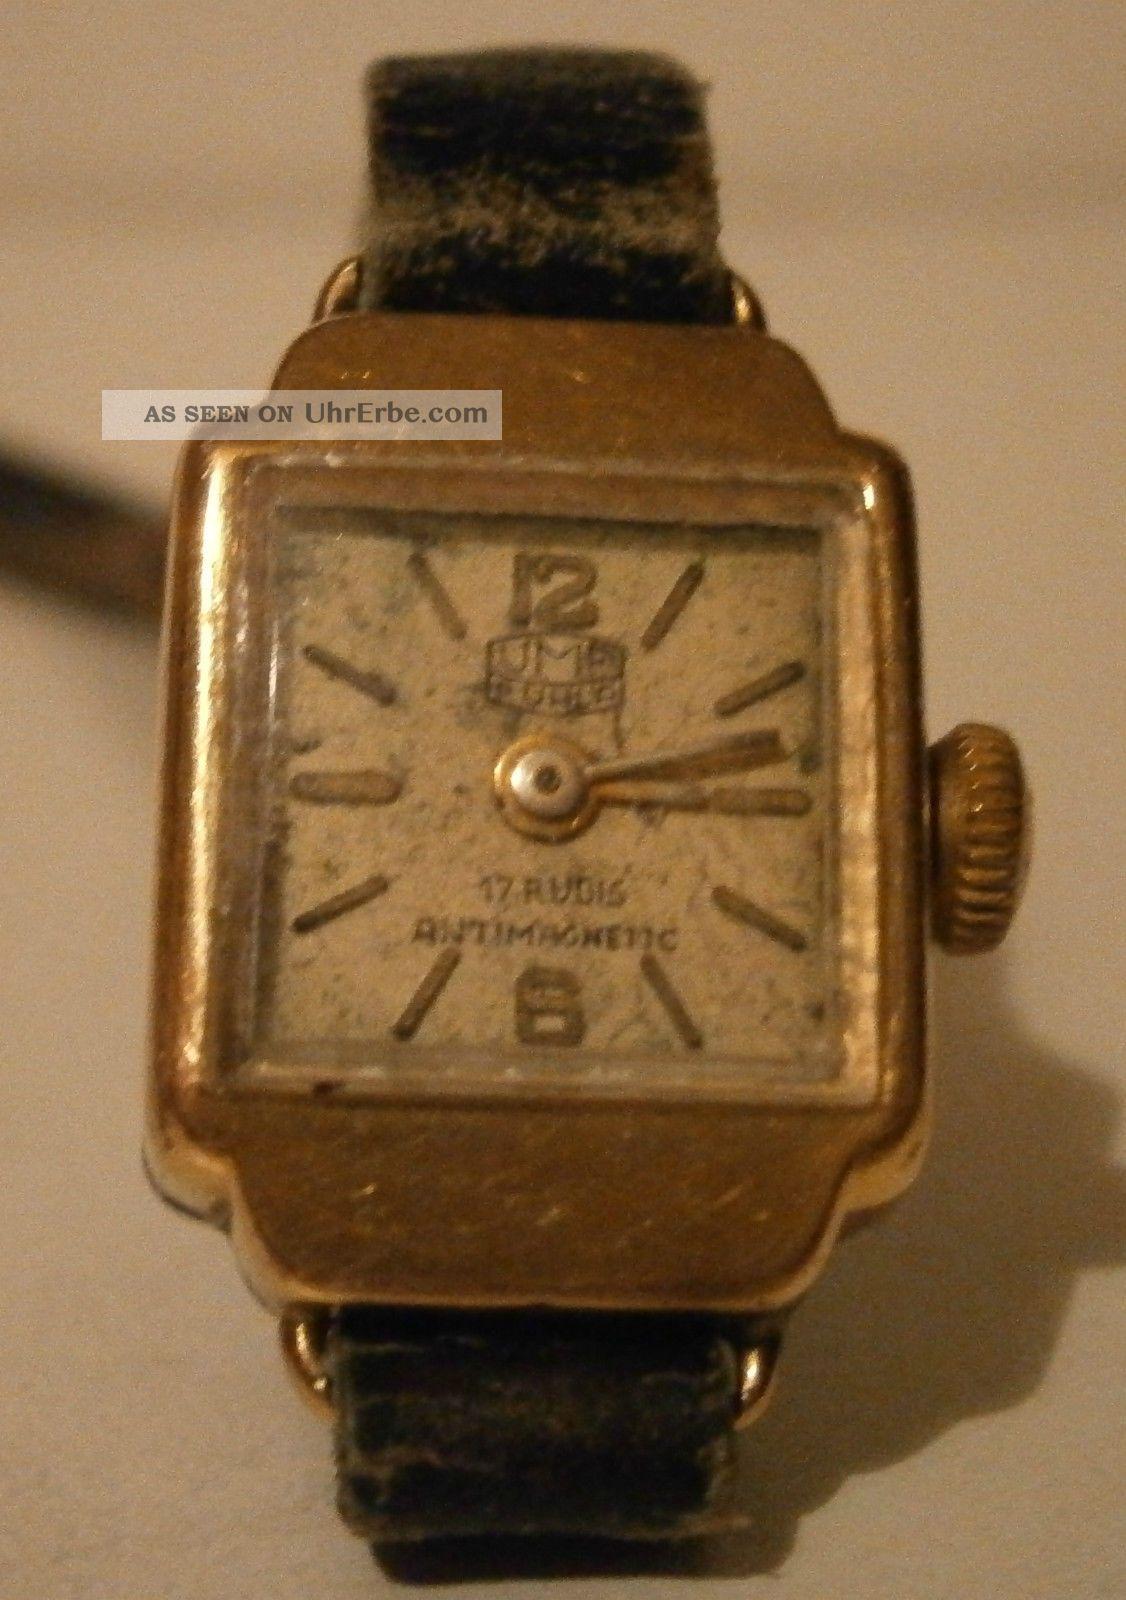 Antikschmuck Ddr Damenuhr Umf Ruhla 17 Rubis Armbanduhren Bild